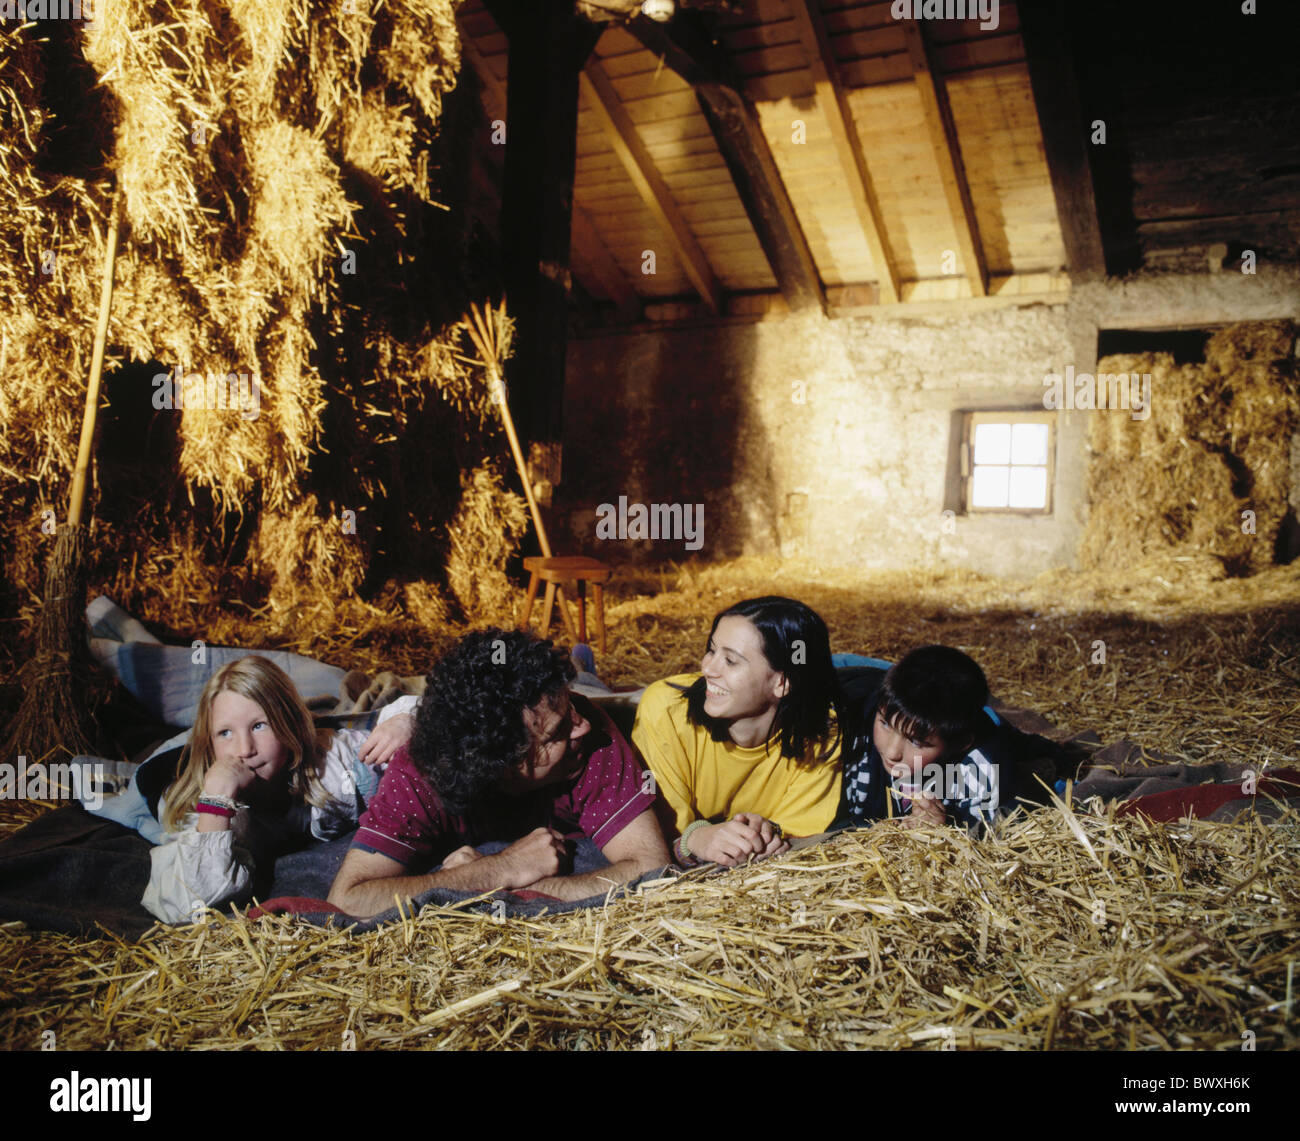 farm family holidays spare time hayloft in straw recumbent sleeping straw canton Jura Switzerland Europe - Stock Image